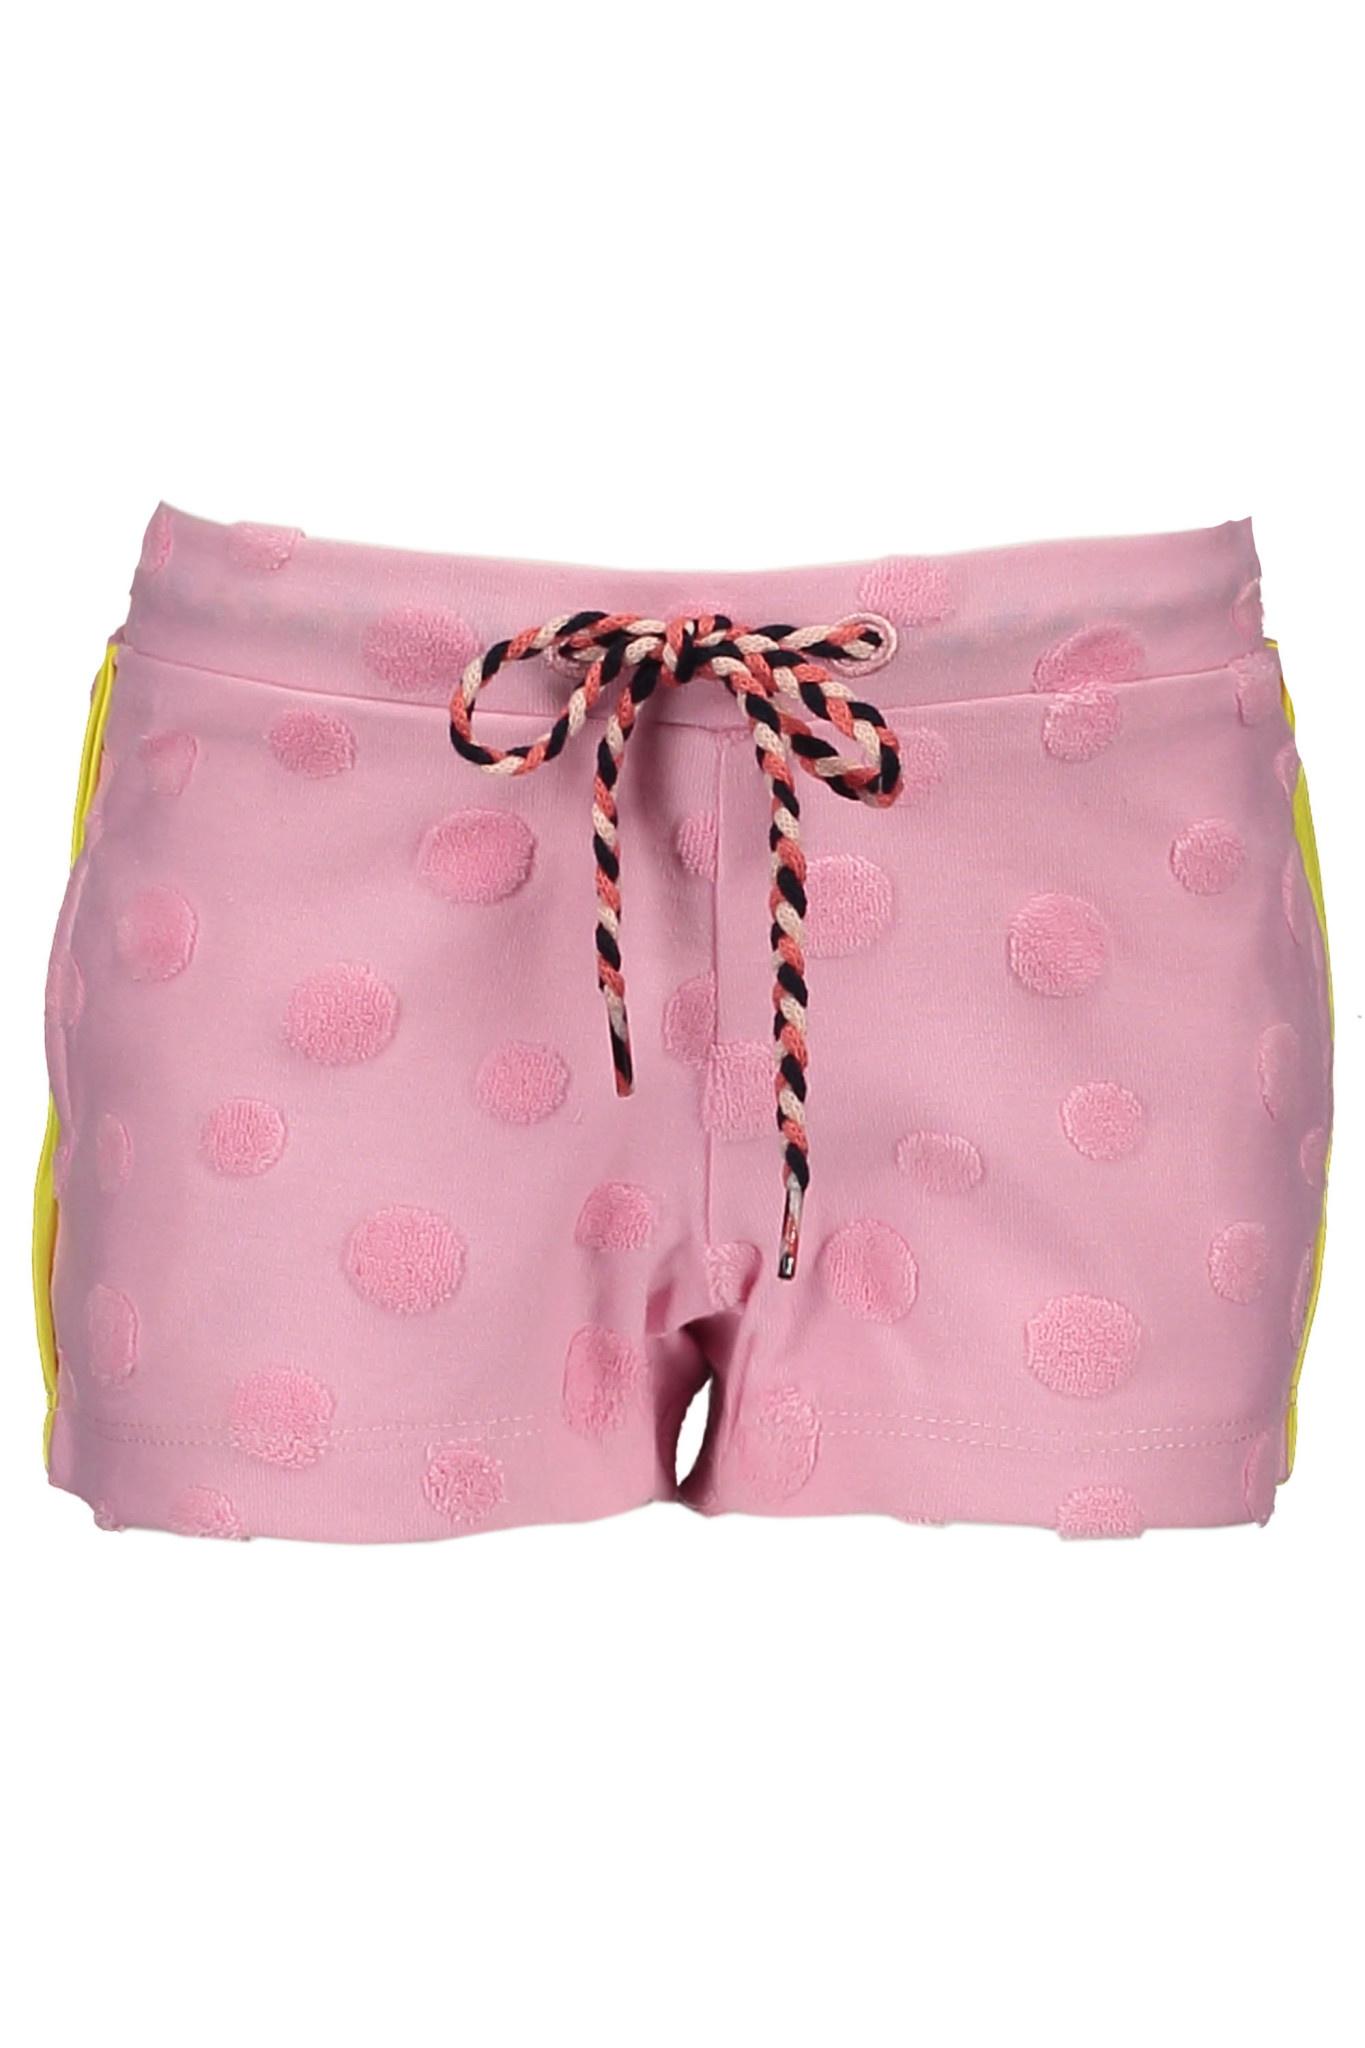 Bampidano Bampidano short fancy fabric + knitted stripe tape pink